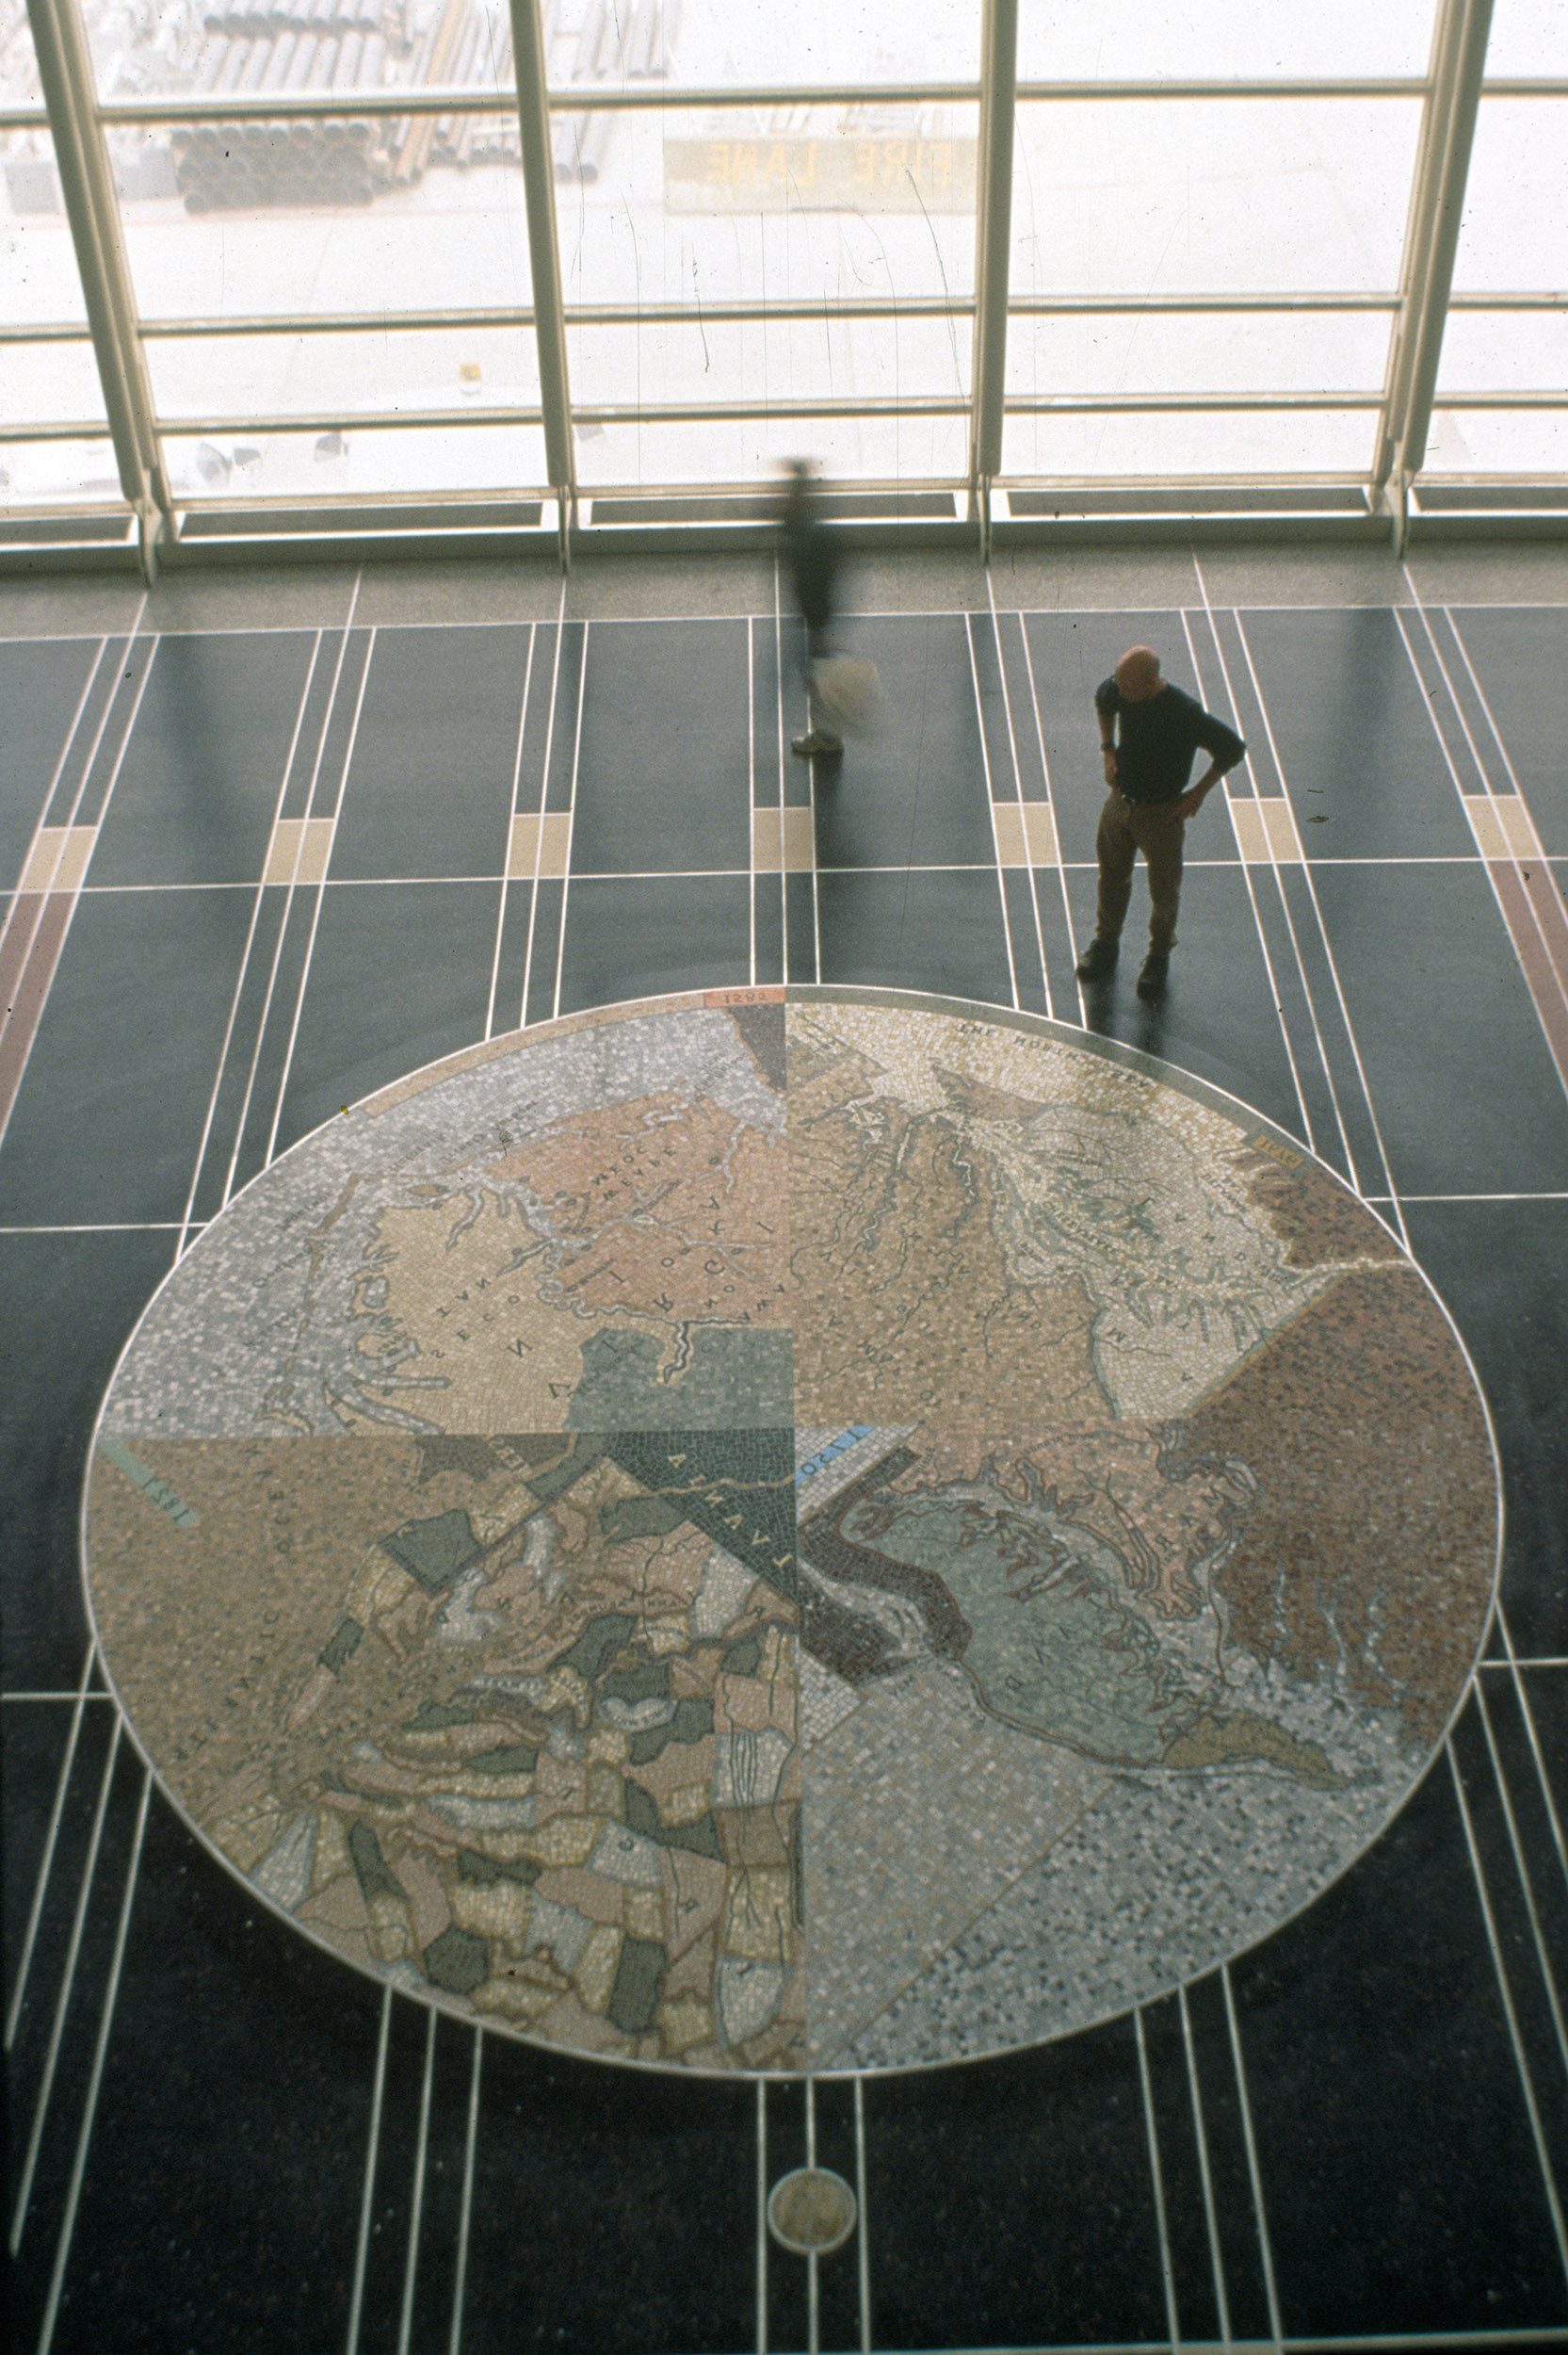 1997 National Airport, Washington DC